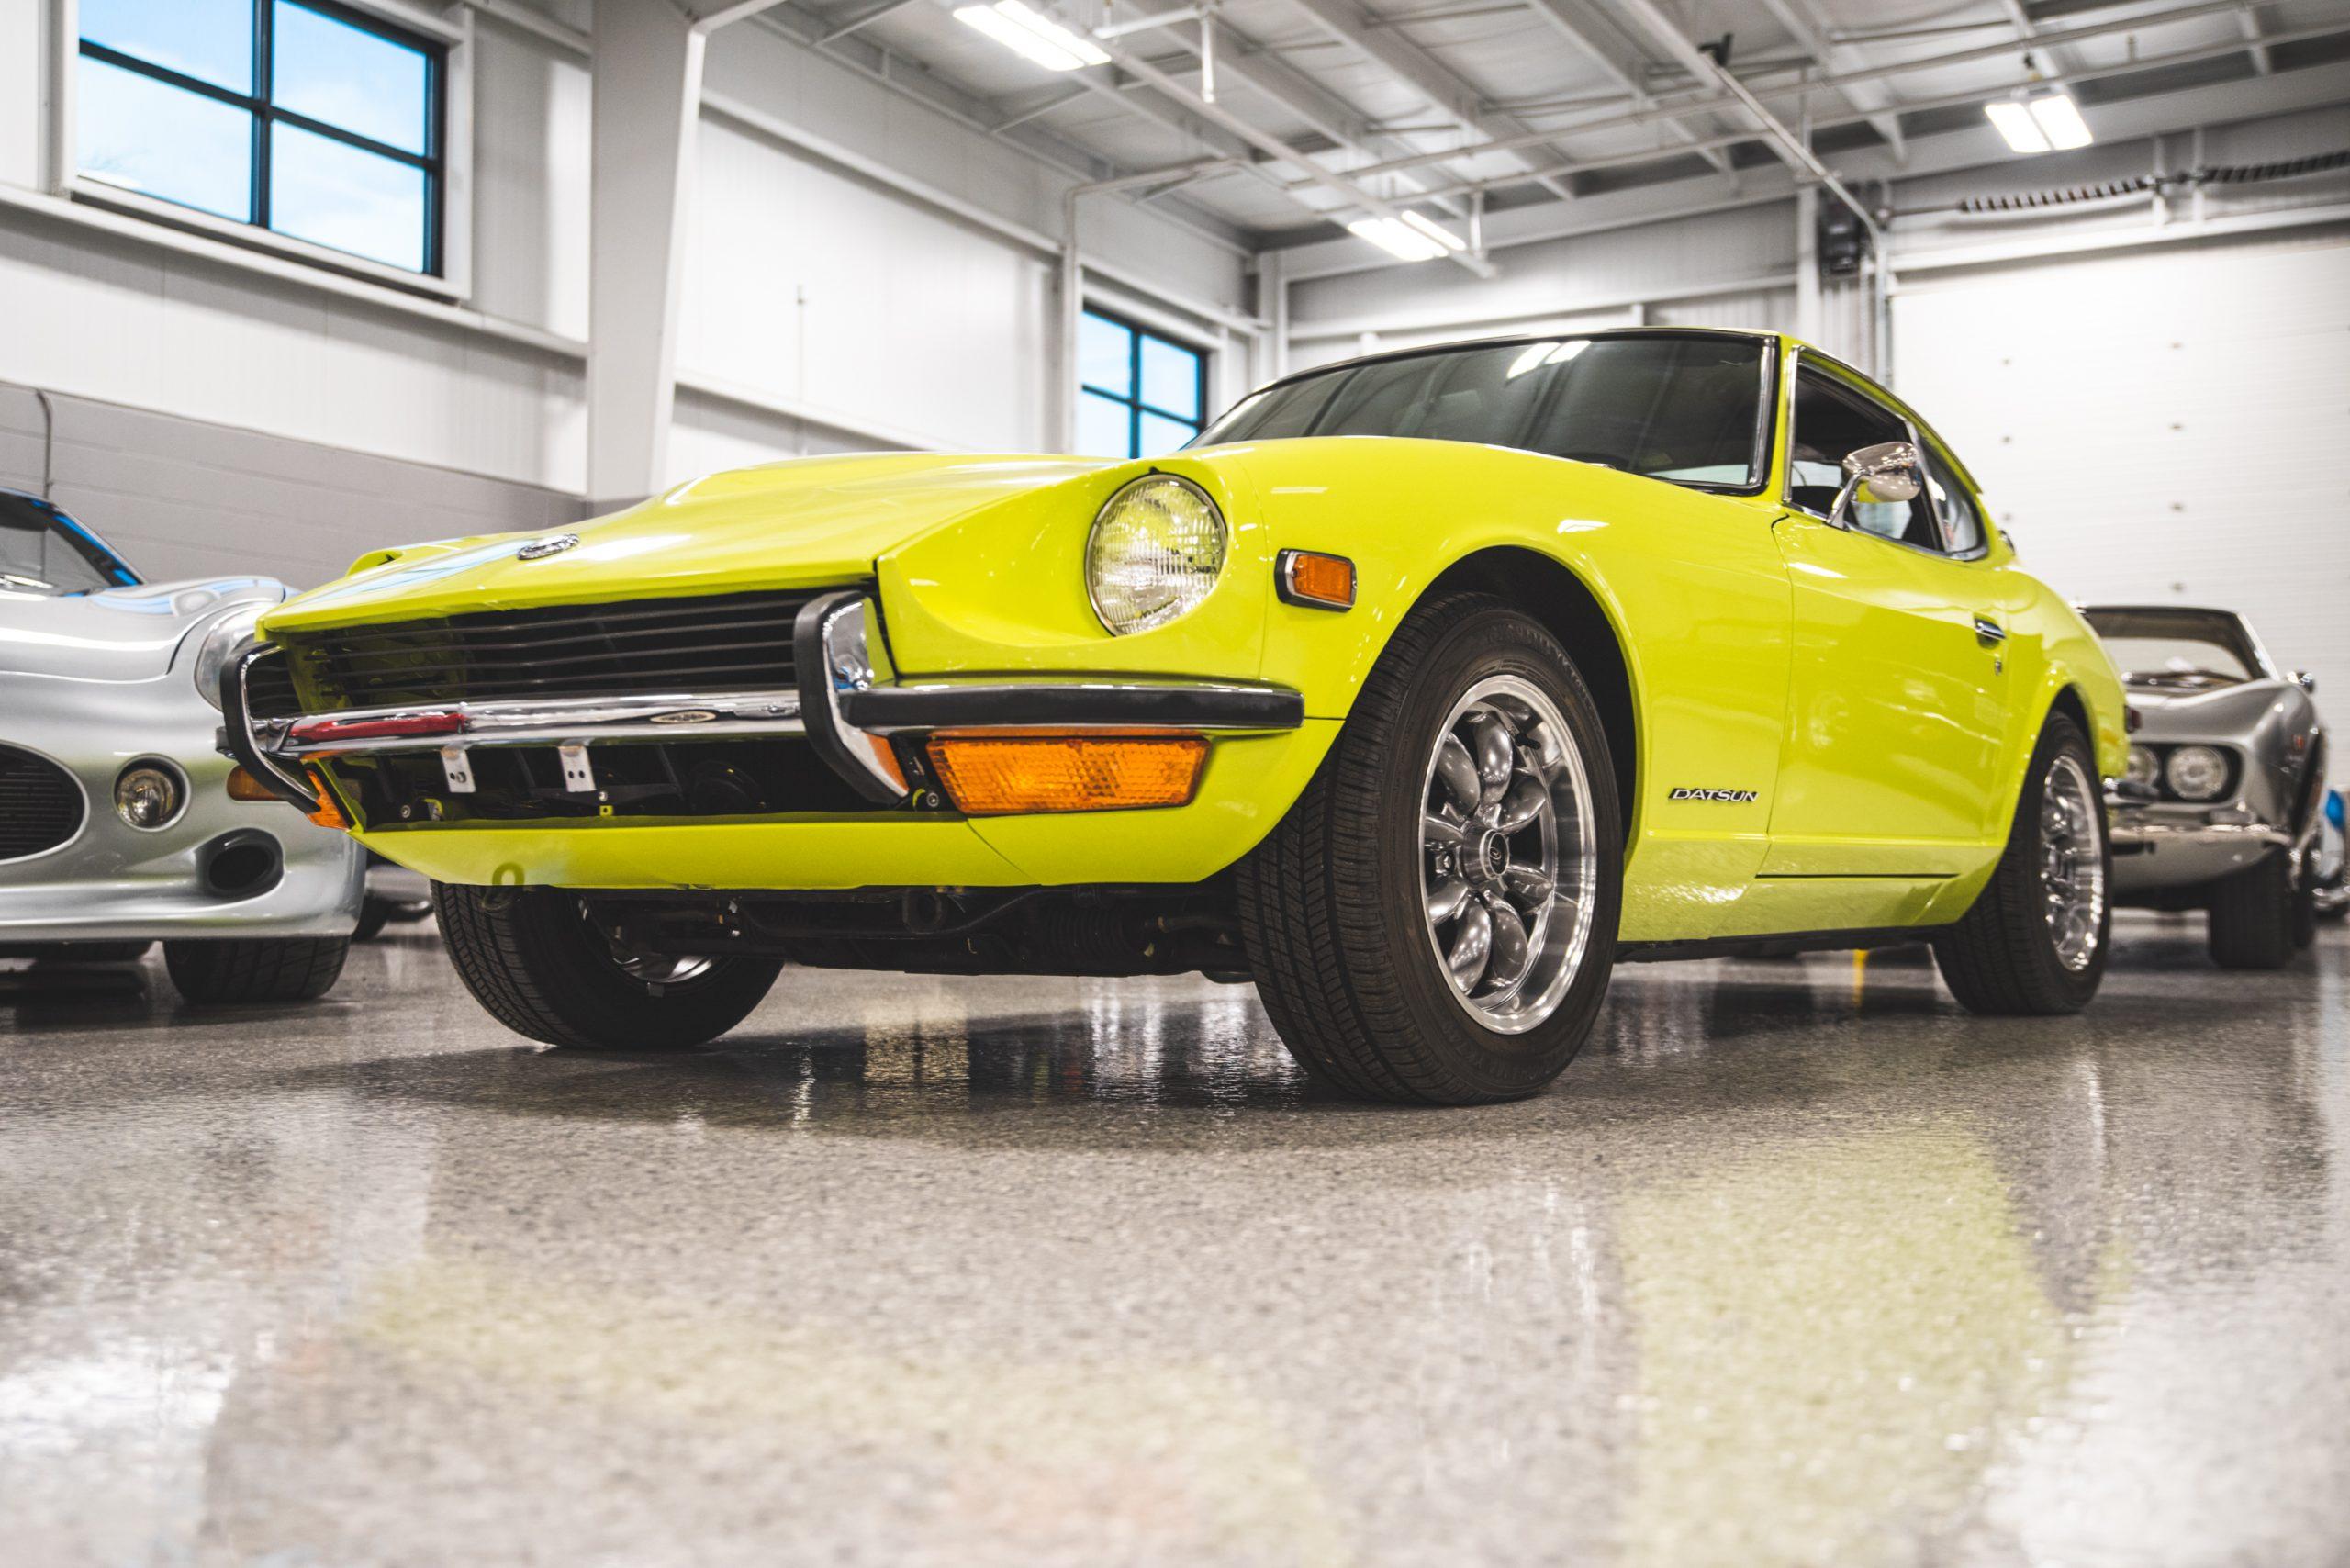 1972 datsun 240z front three-quarter close